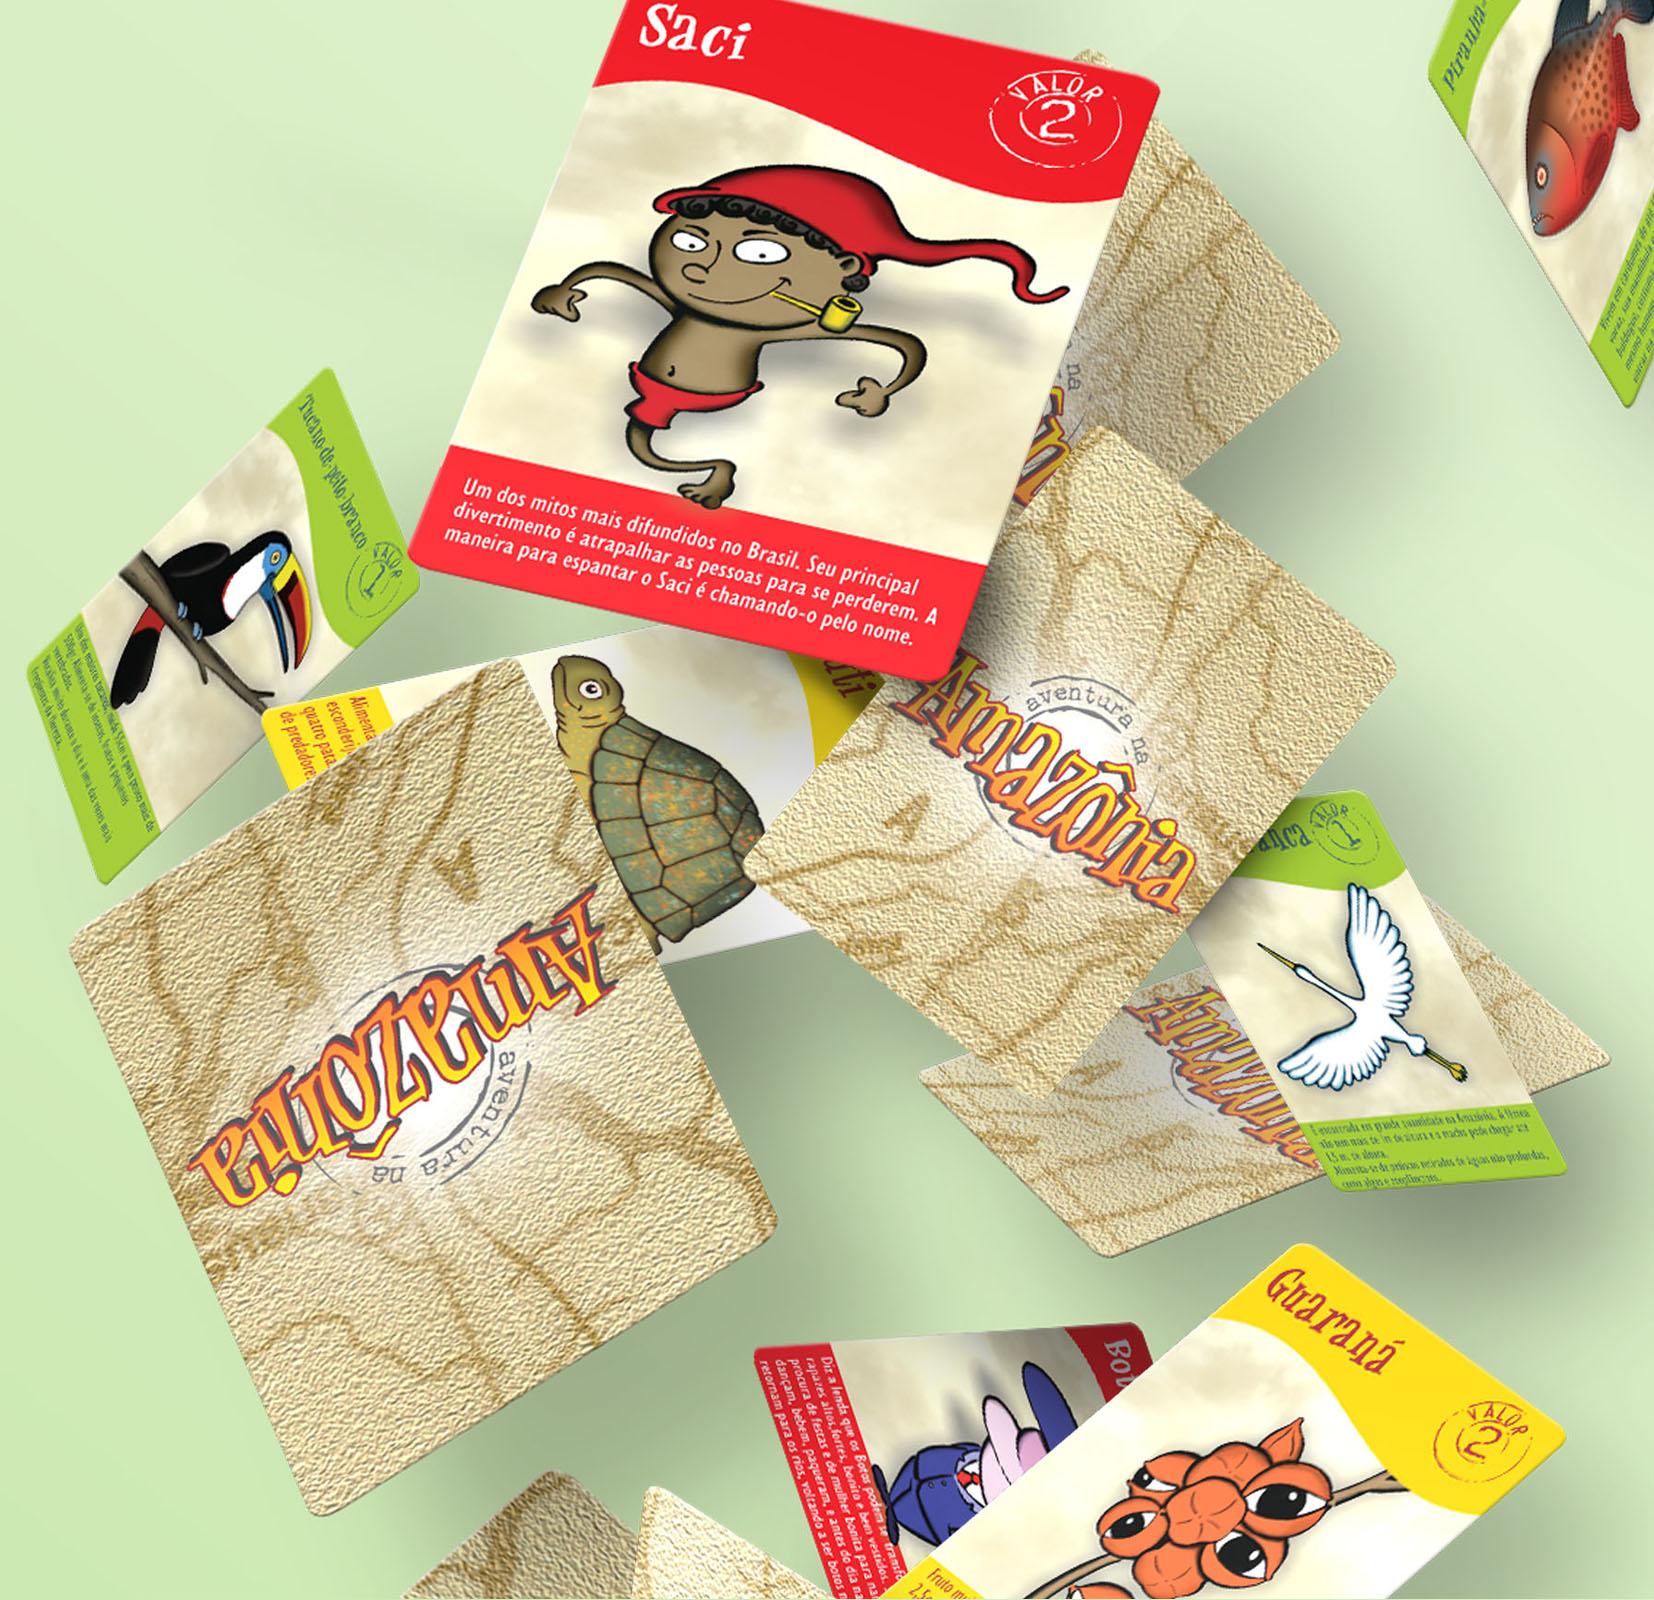 cartas-aventura-amazonia-detalhe-d